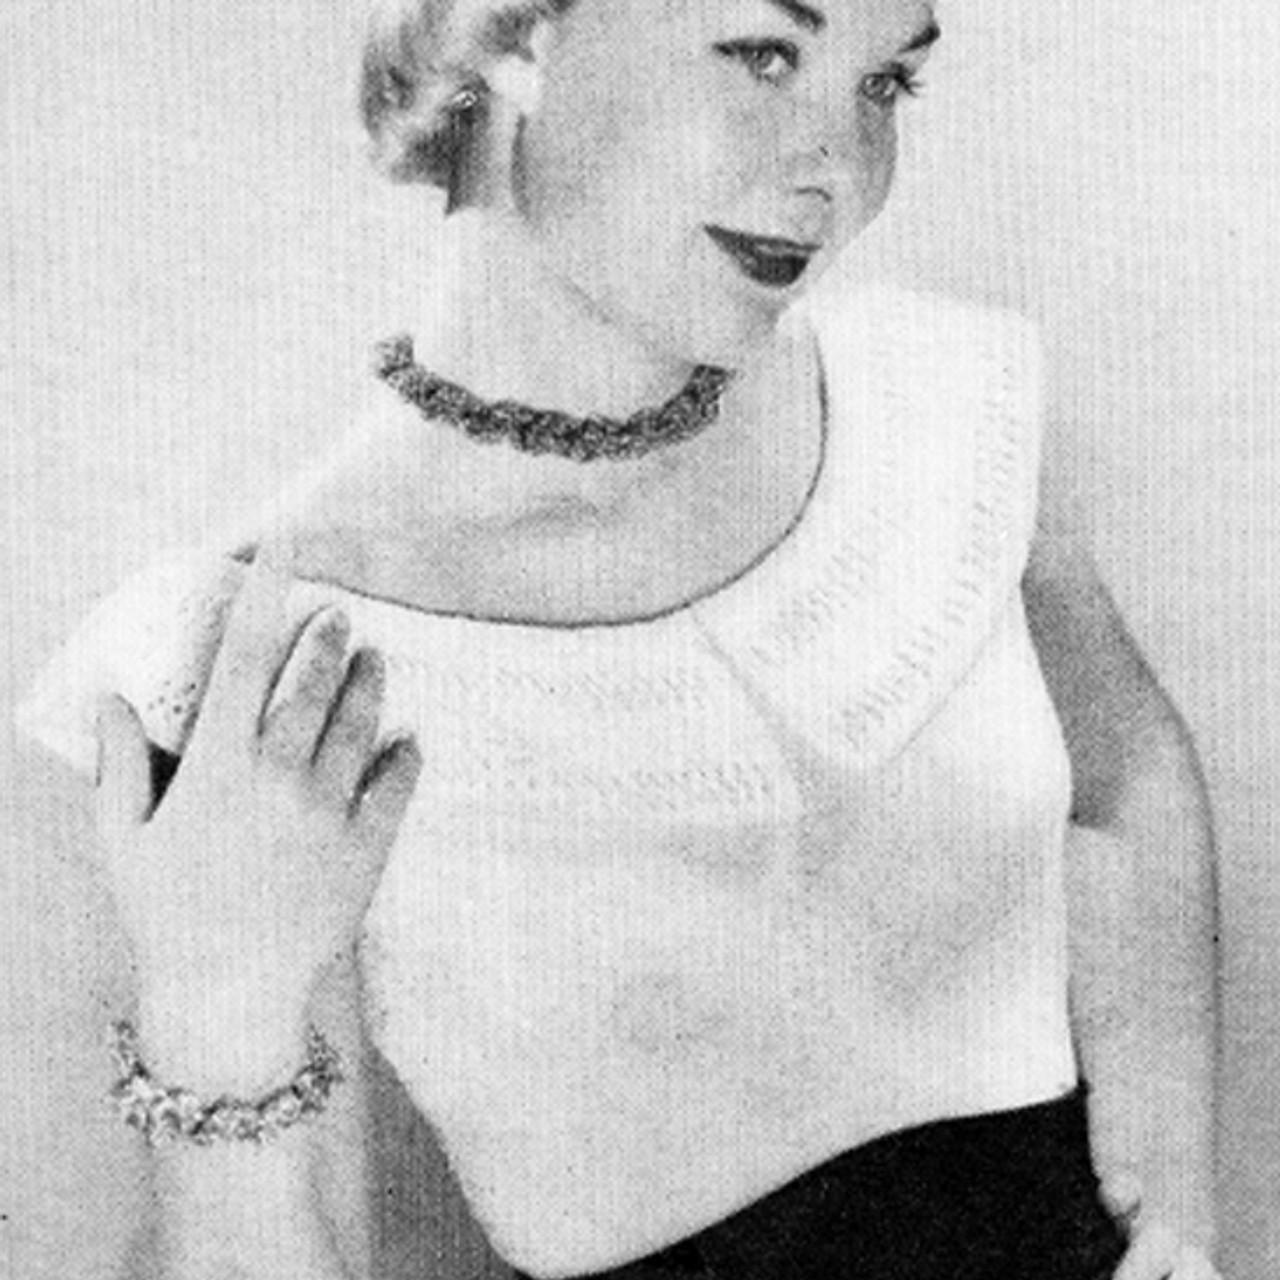 Knitting pattern collared peasant blouse